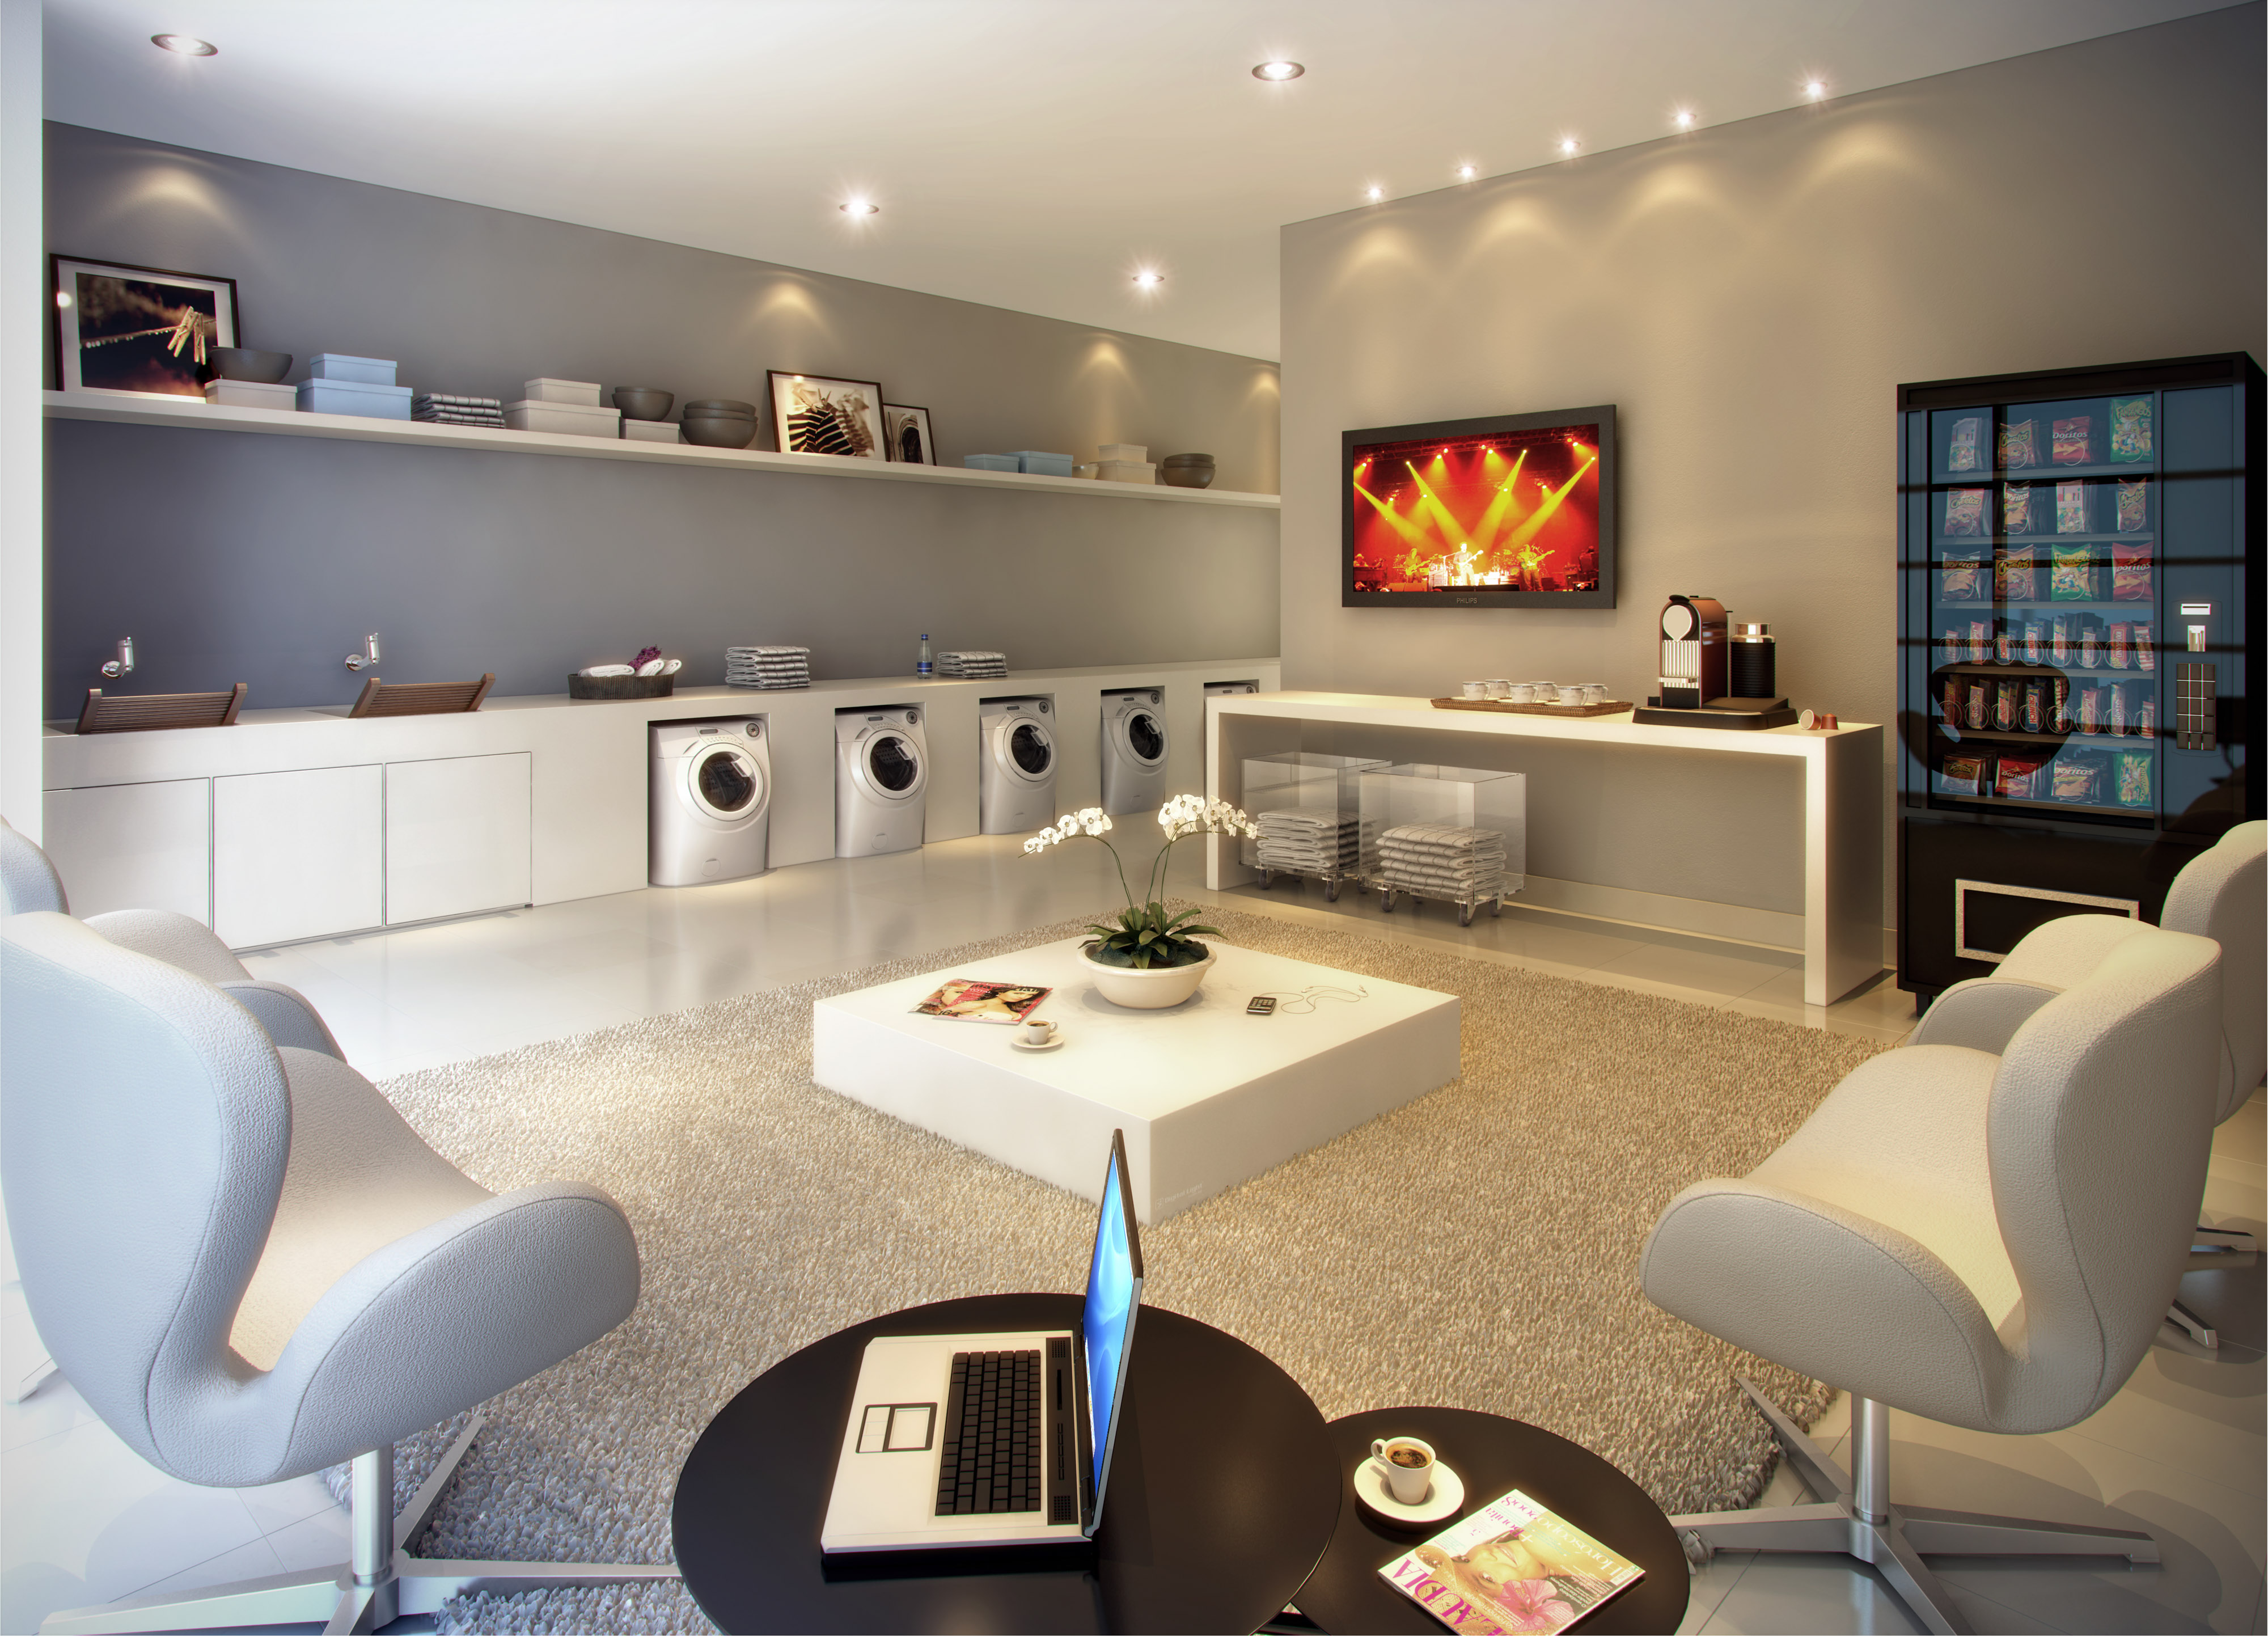 Loundry'n'lounge